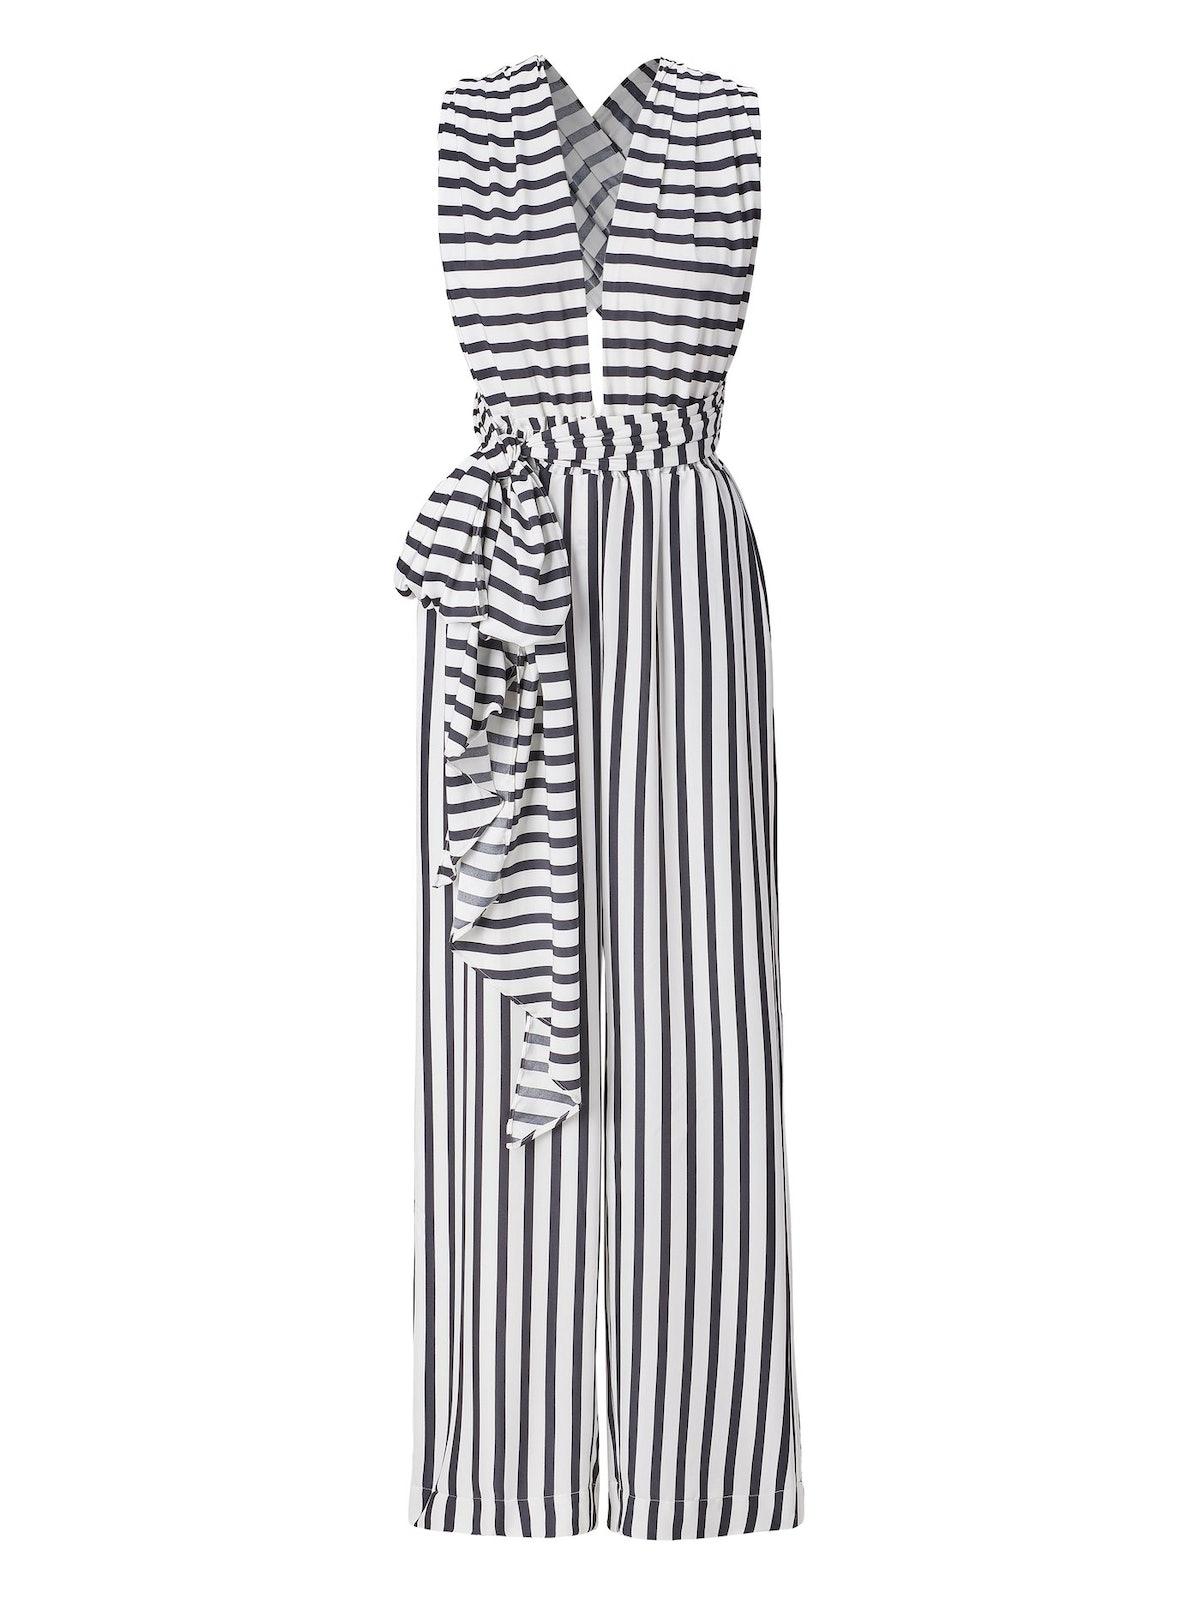 Diarrablu Umy Lines Convertible Jumpsuit